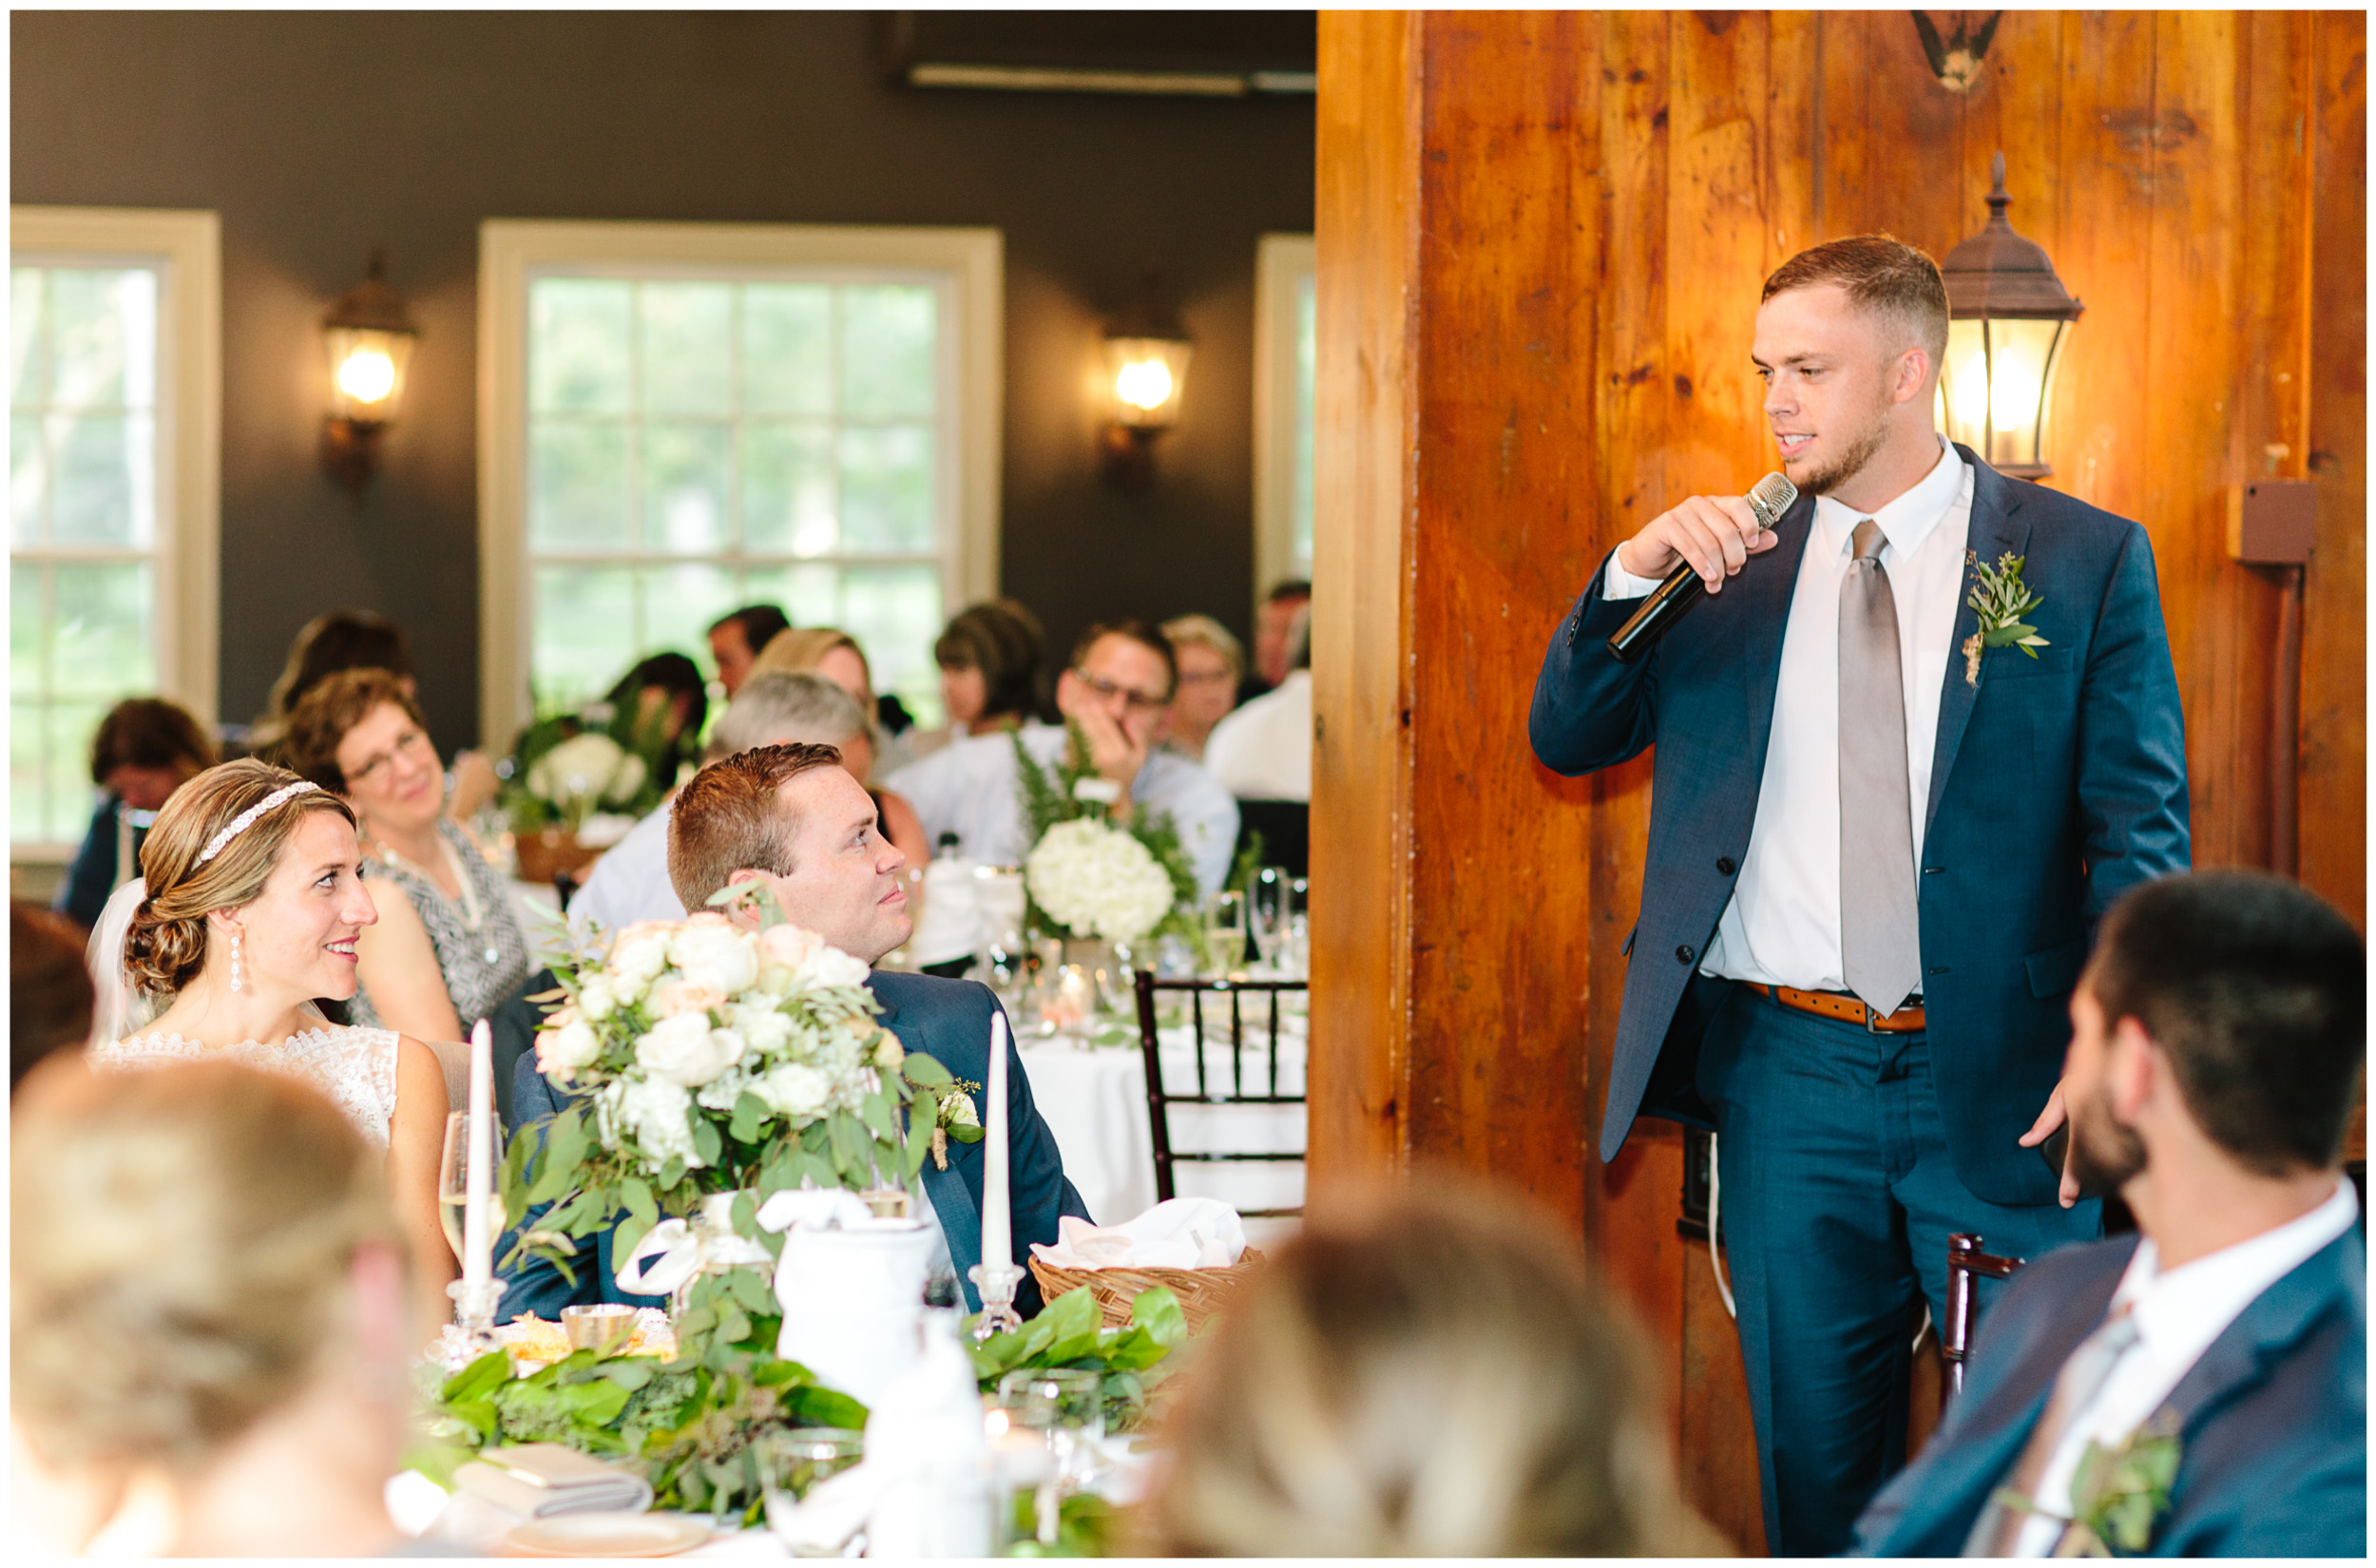 ann_arbor_michigan_wedding_84.jpg